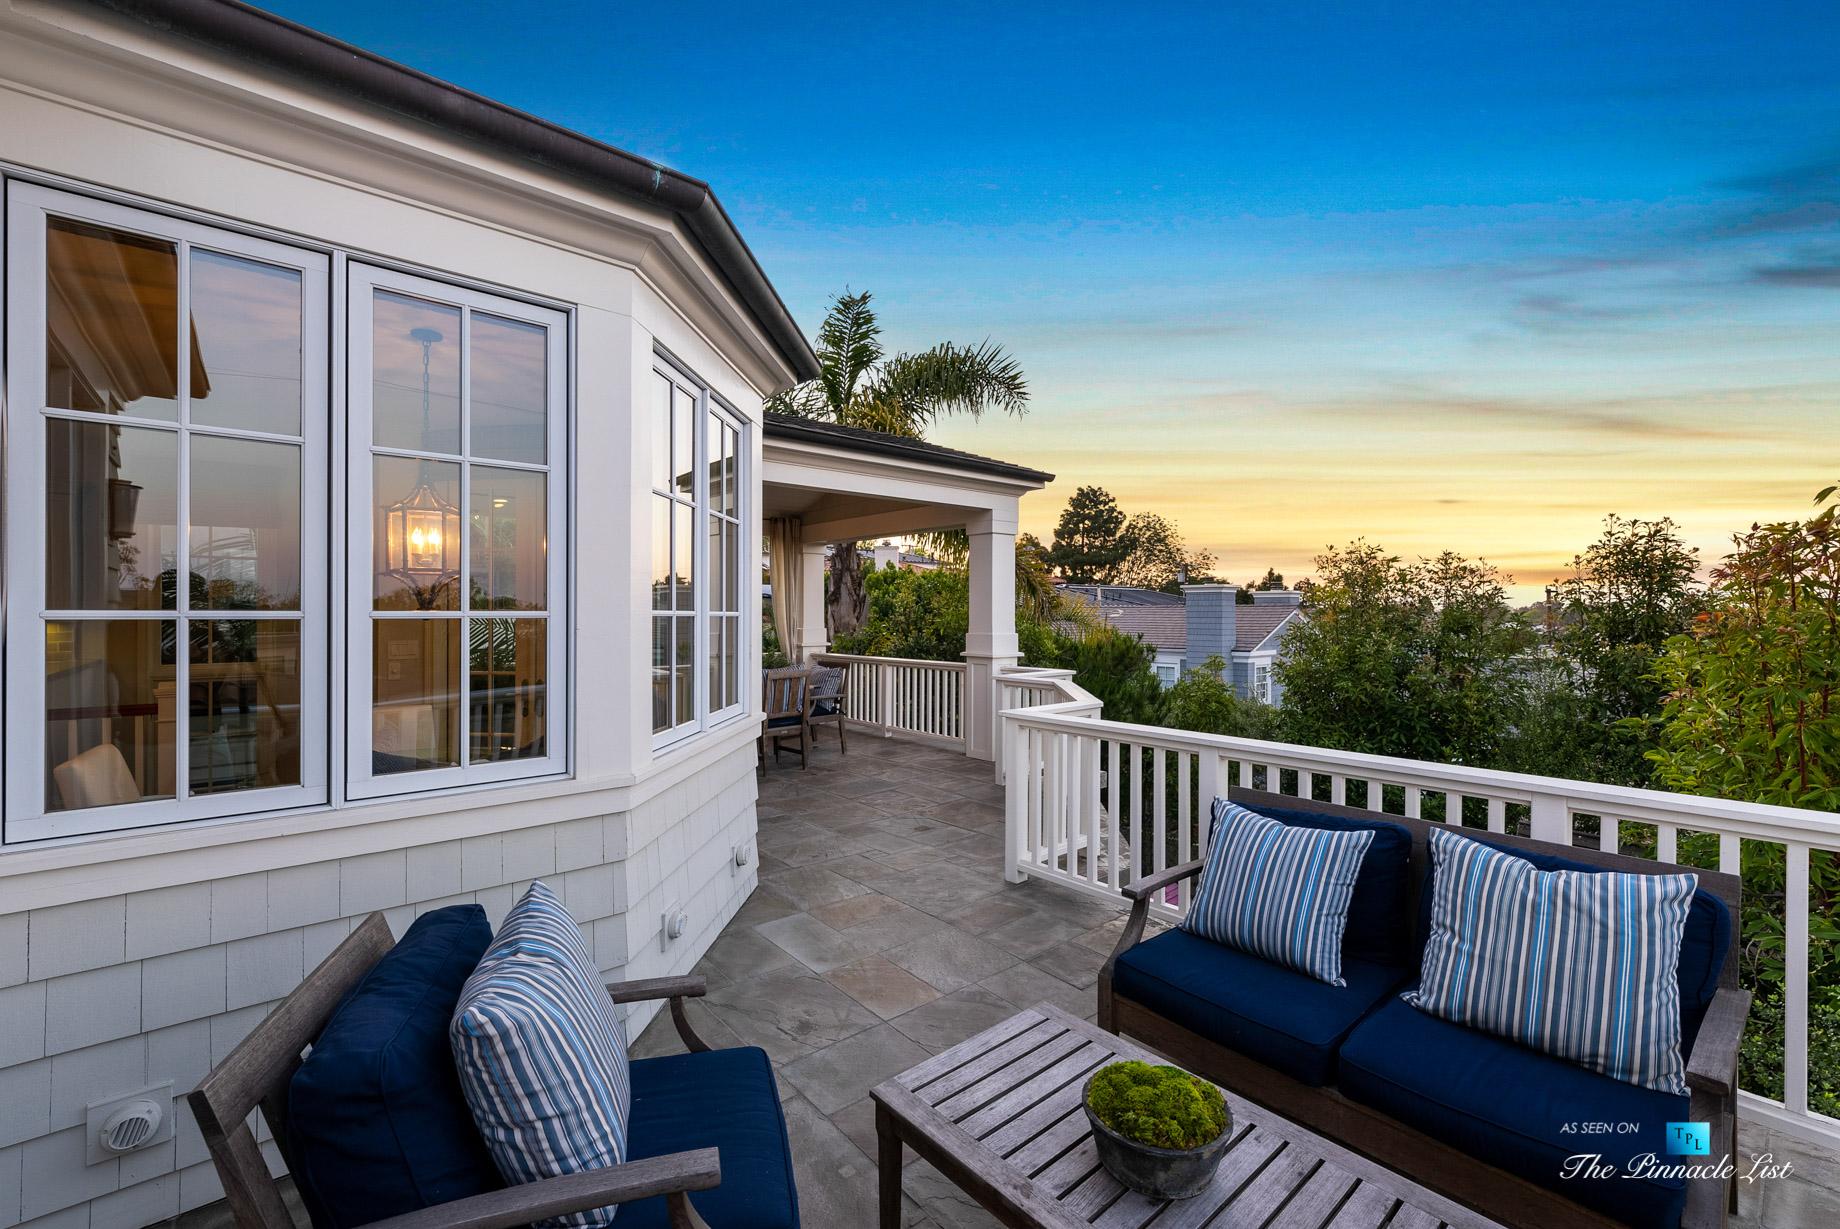 877 8th Street, Manhattan Beach, CA, USA – Top Level Patio Twilight Seating View